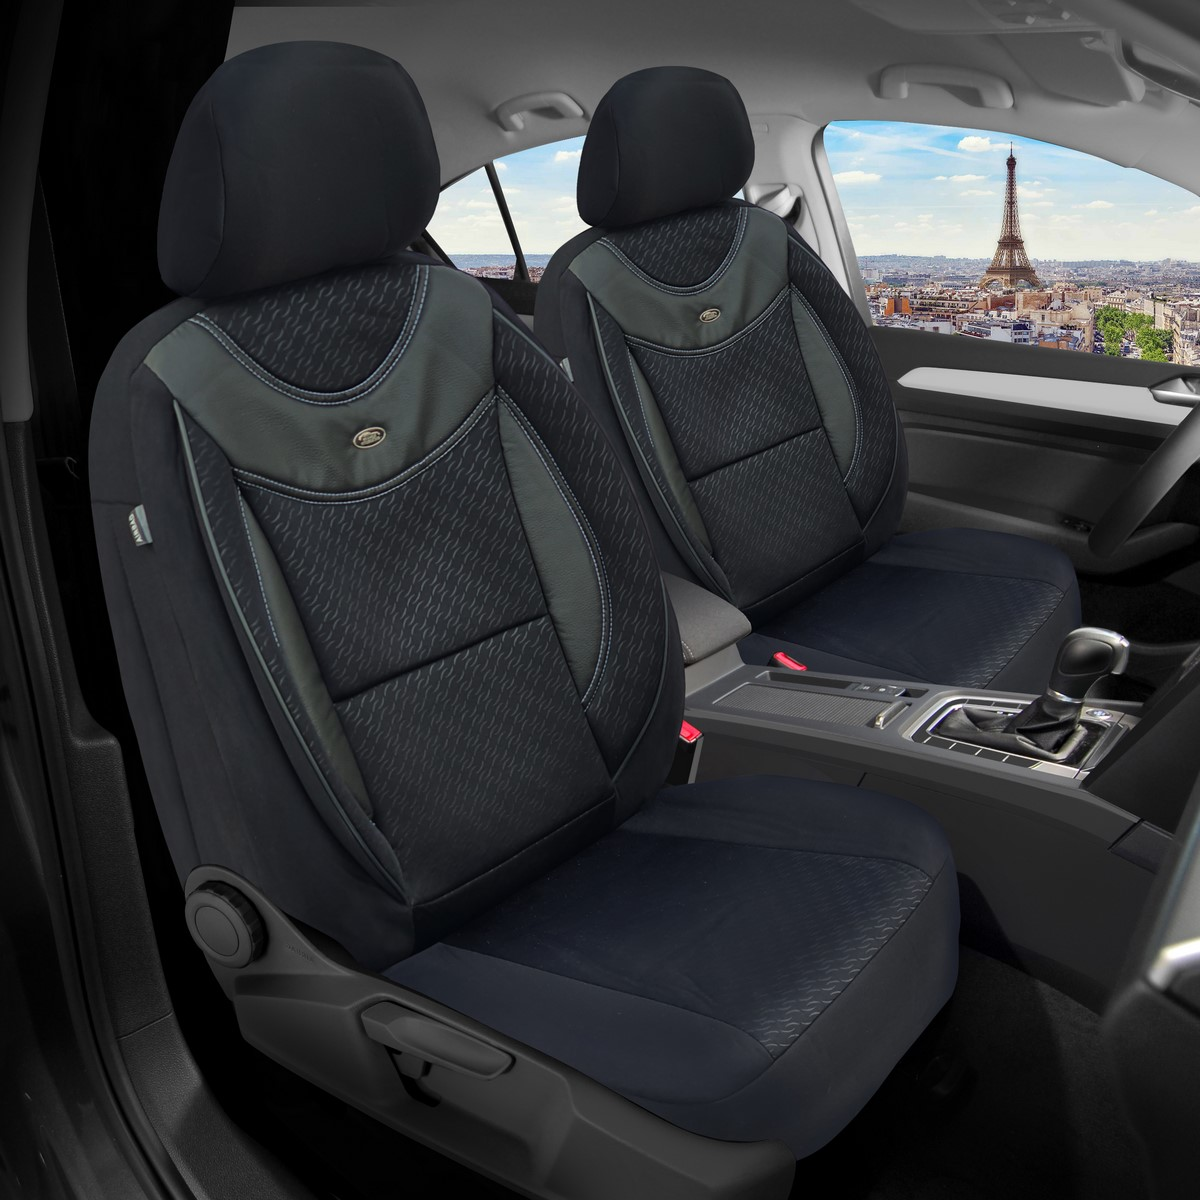 Maß Sitzbezüge Lexus CT 200h Fahrer /& Beifahrer ab 2010 FB:G102